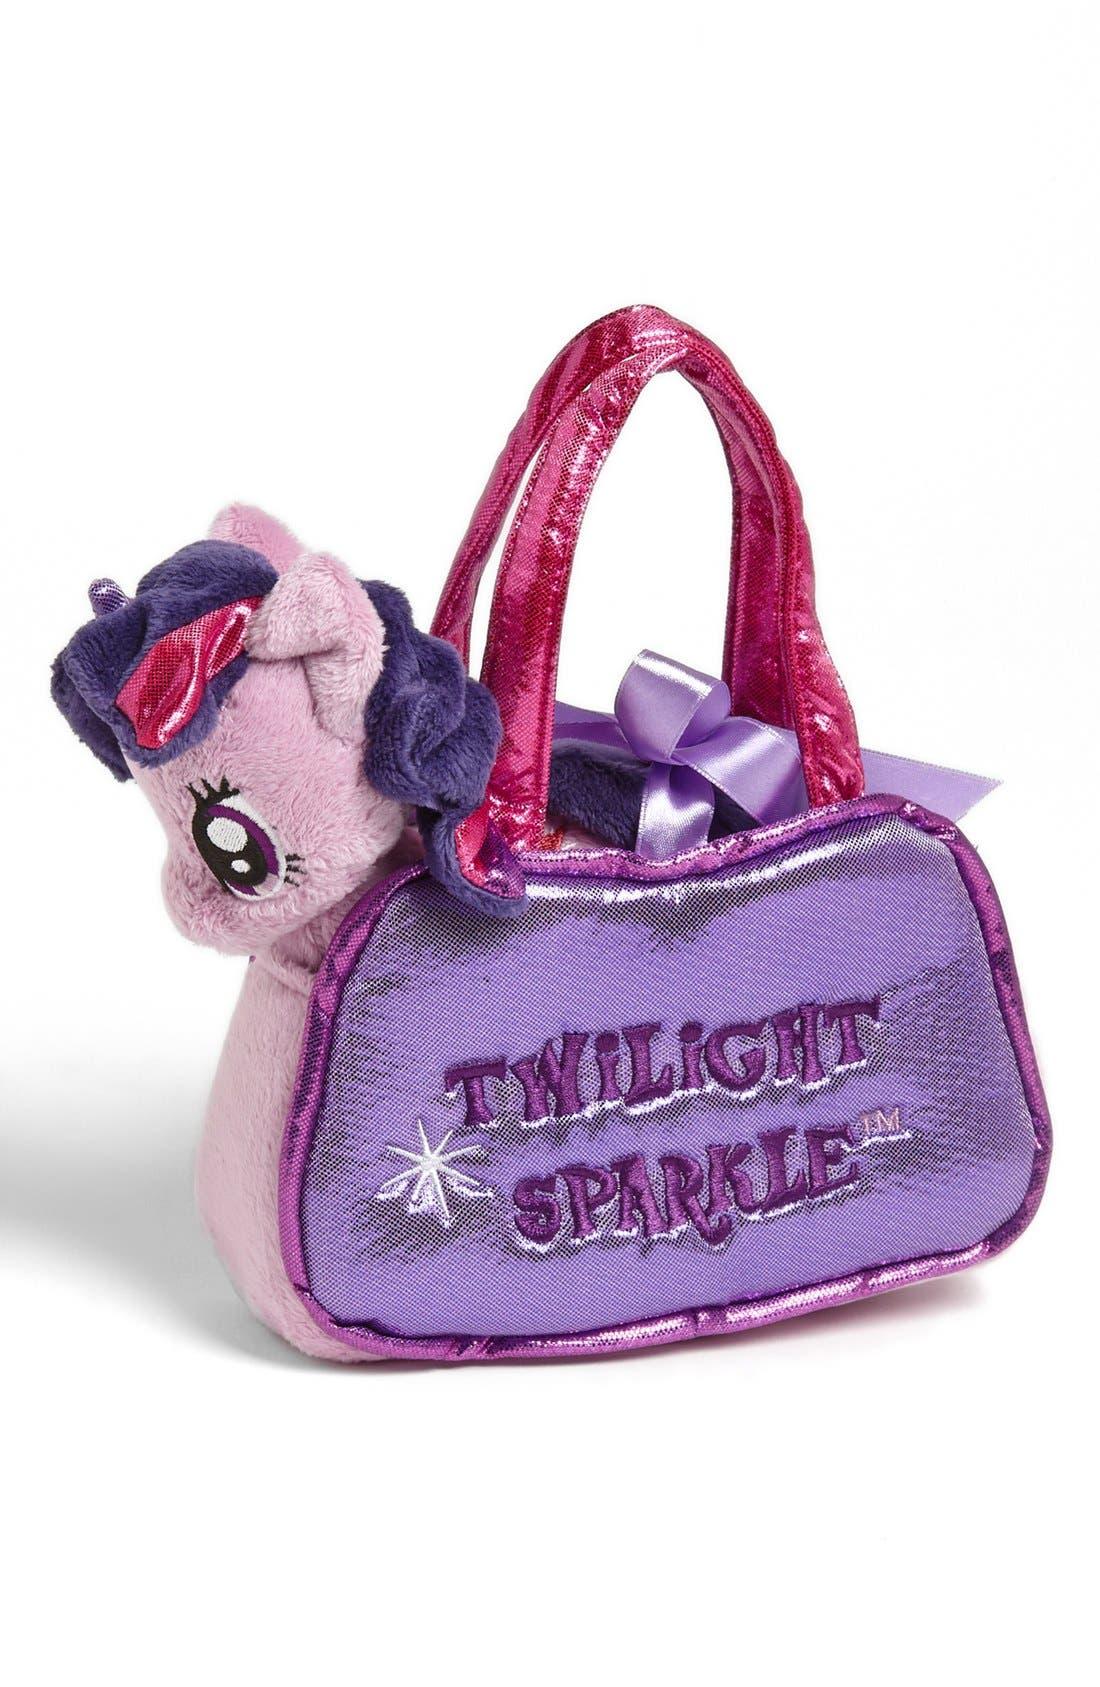 Alternate Image 1 Selected - Aurora World Toys 'My Little Pony® - Twilight Sparkle®' Stuffed Pony & Purse